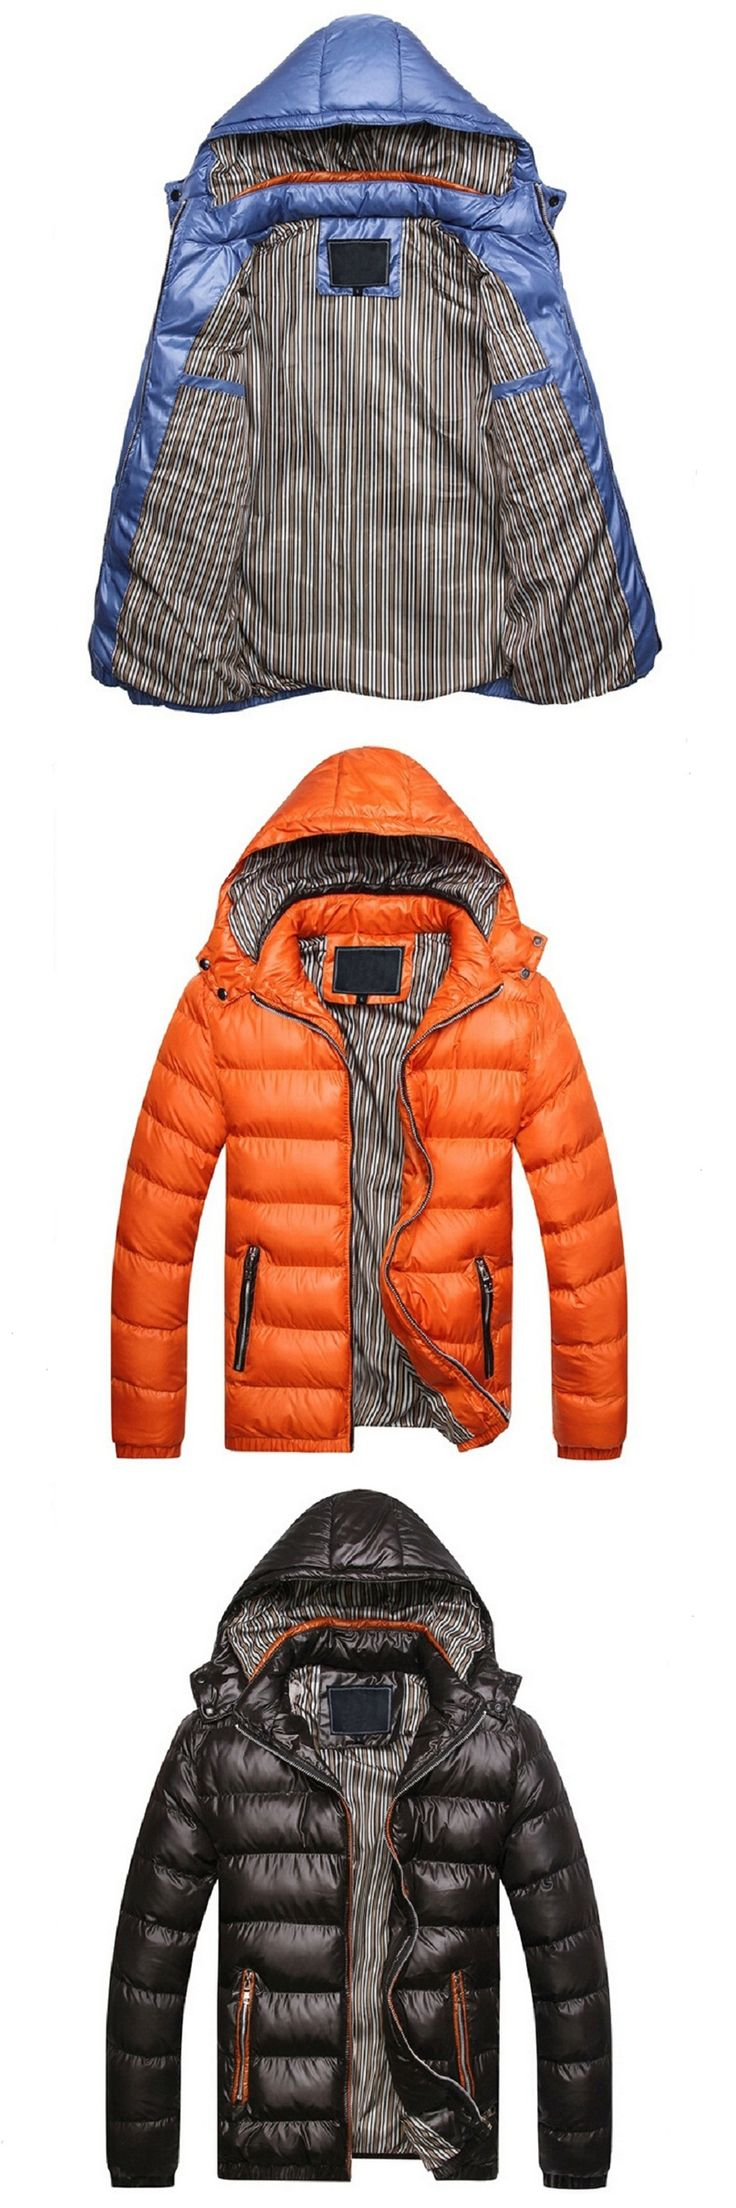 Winter Jacket Men Warm Coat Outwear winter Parka chaquetas plumas hombre Casaco for mens coats and jackets Plus size XXXL